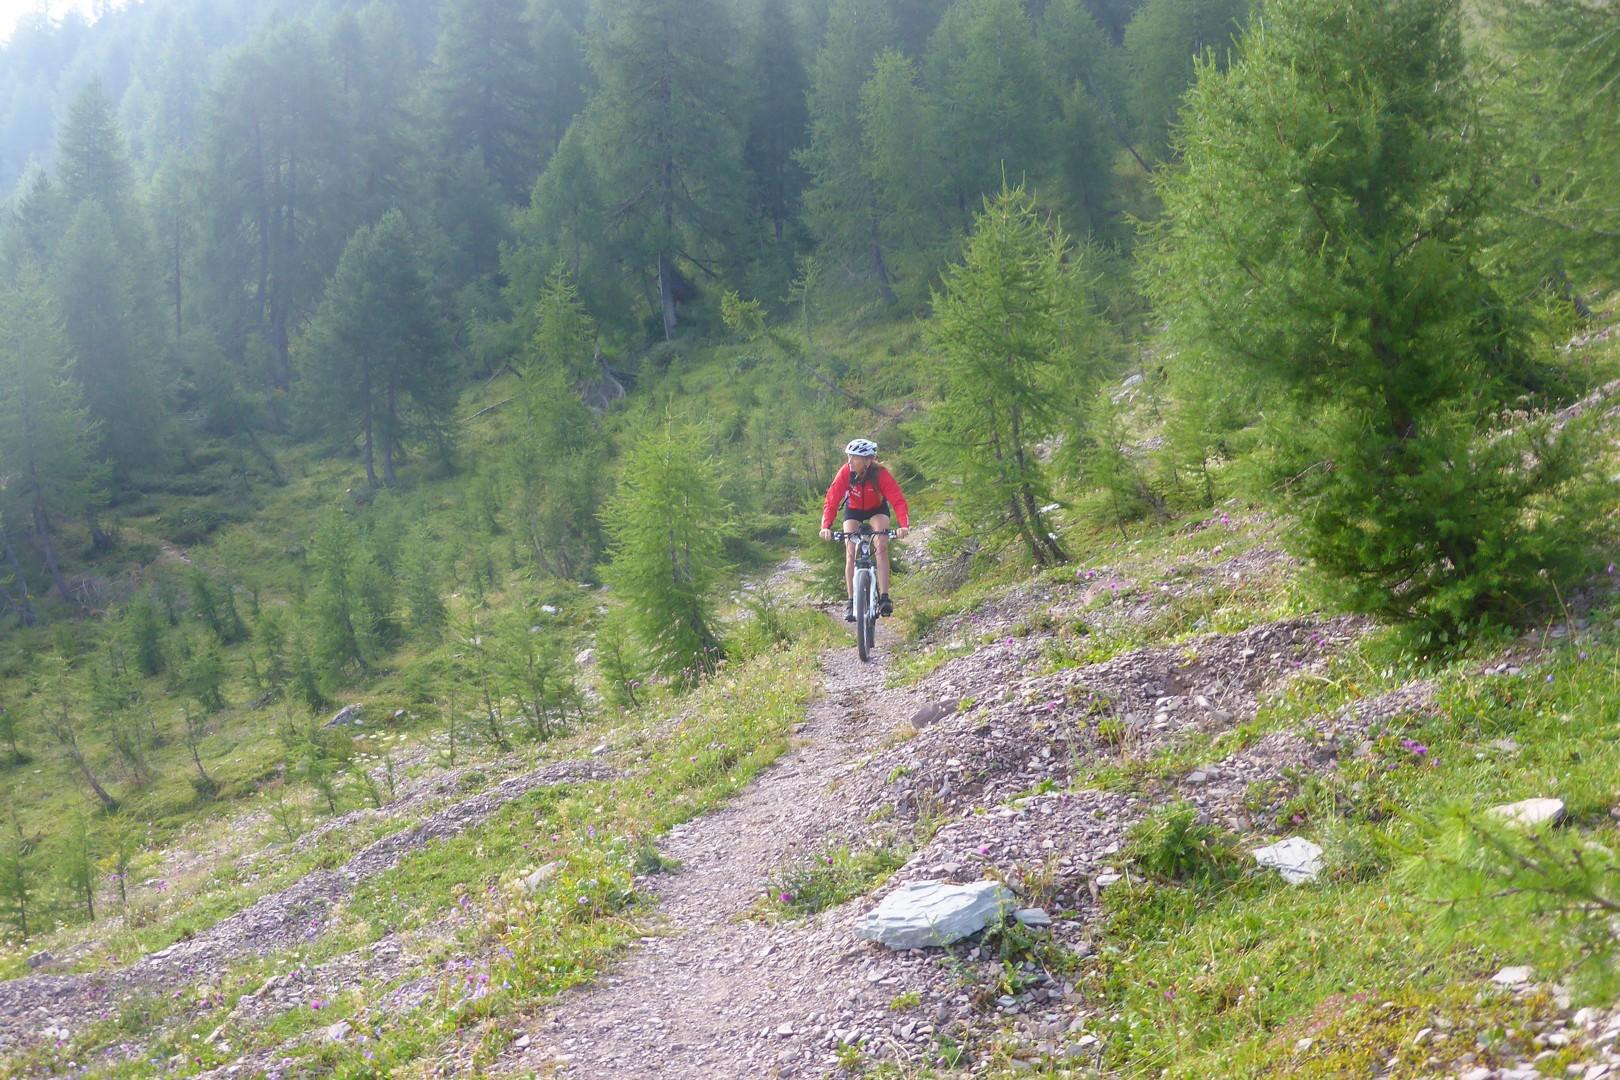 Dolomiti MTB - 1306.jpg - Italy - Dolomites of Brenta - Guided Mountain Bike Holiday - Mountain Biking